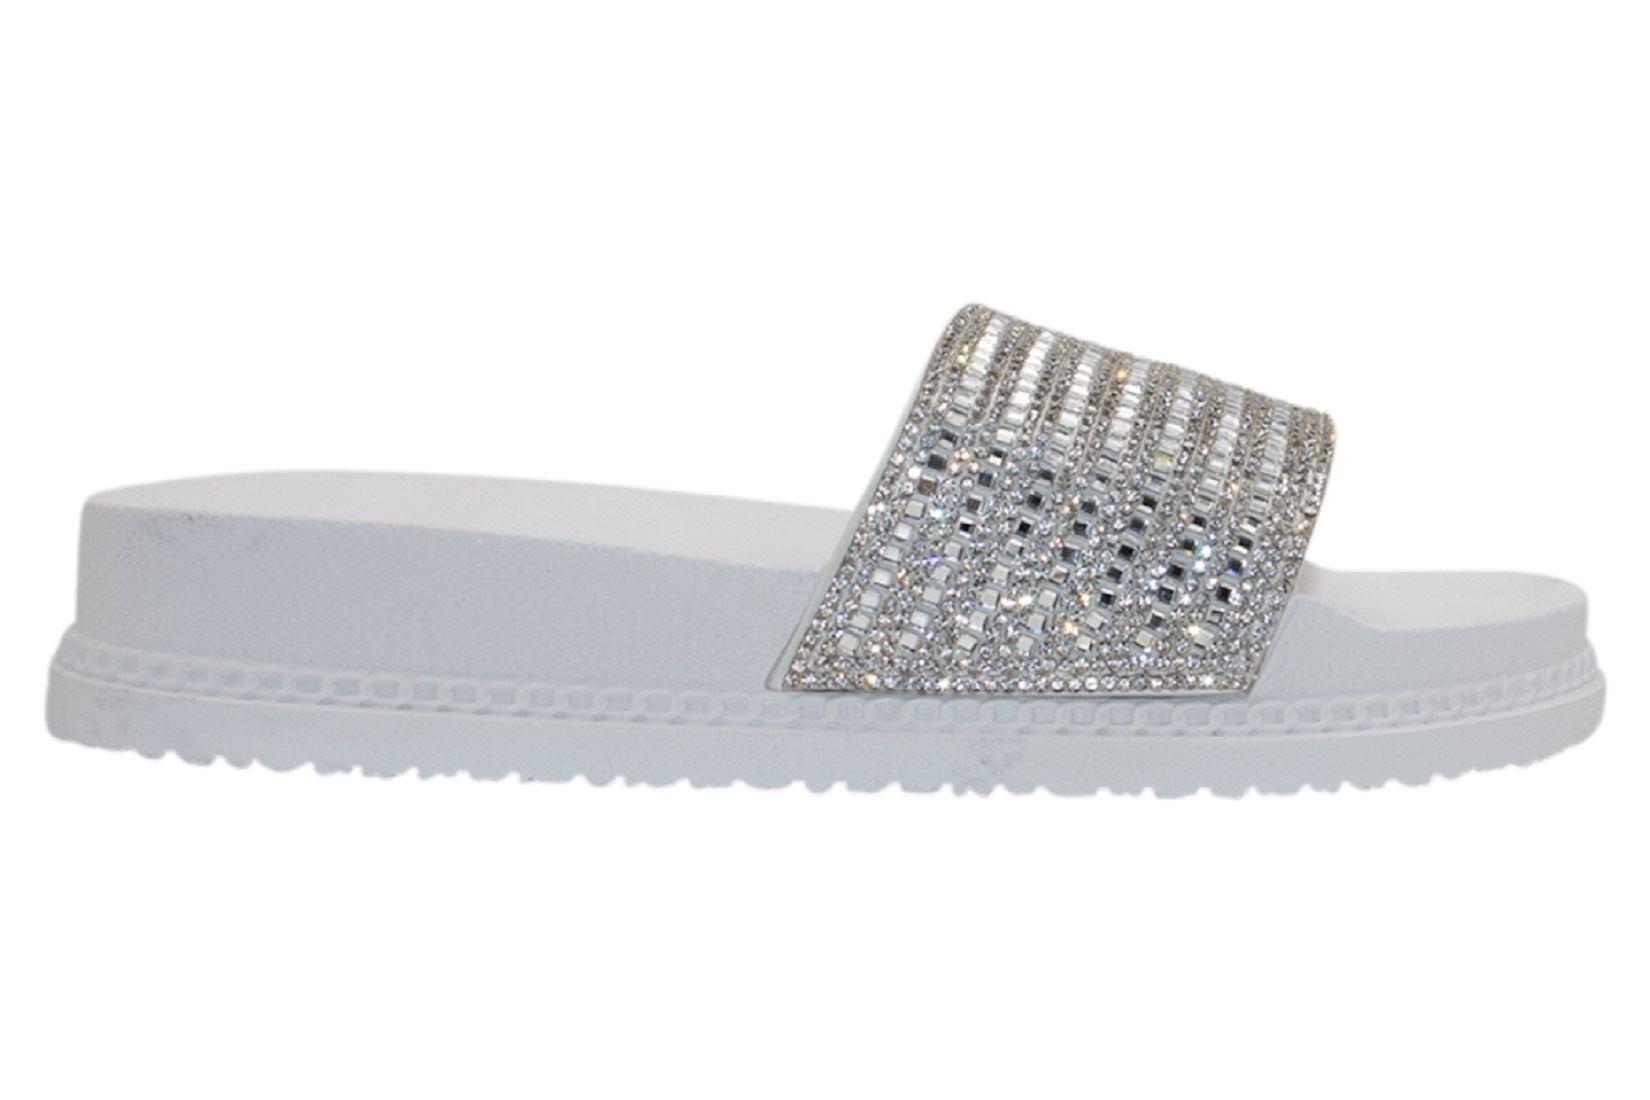 Womens-Sliders-Casual-Slippers-Mules-Ladies-Diamante-Flip-Flop-Sandals-Shoes thumbnail 87